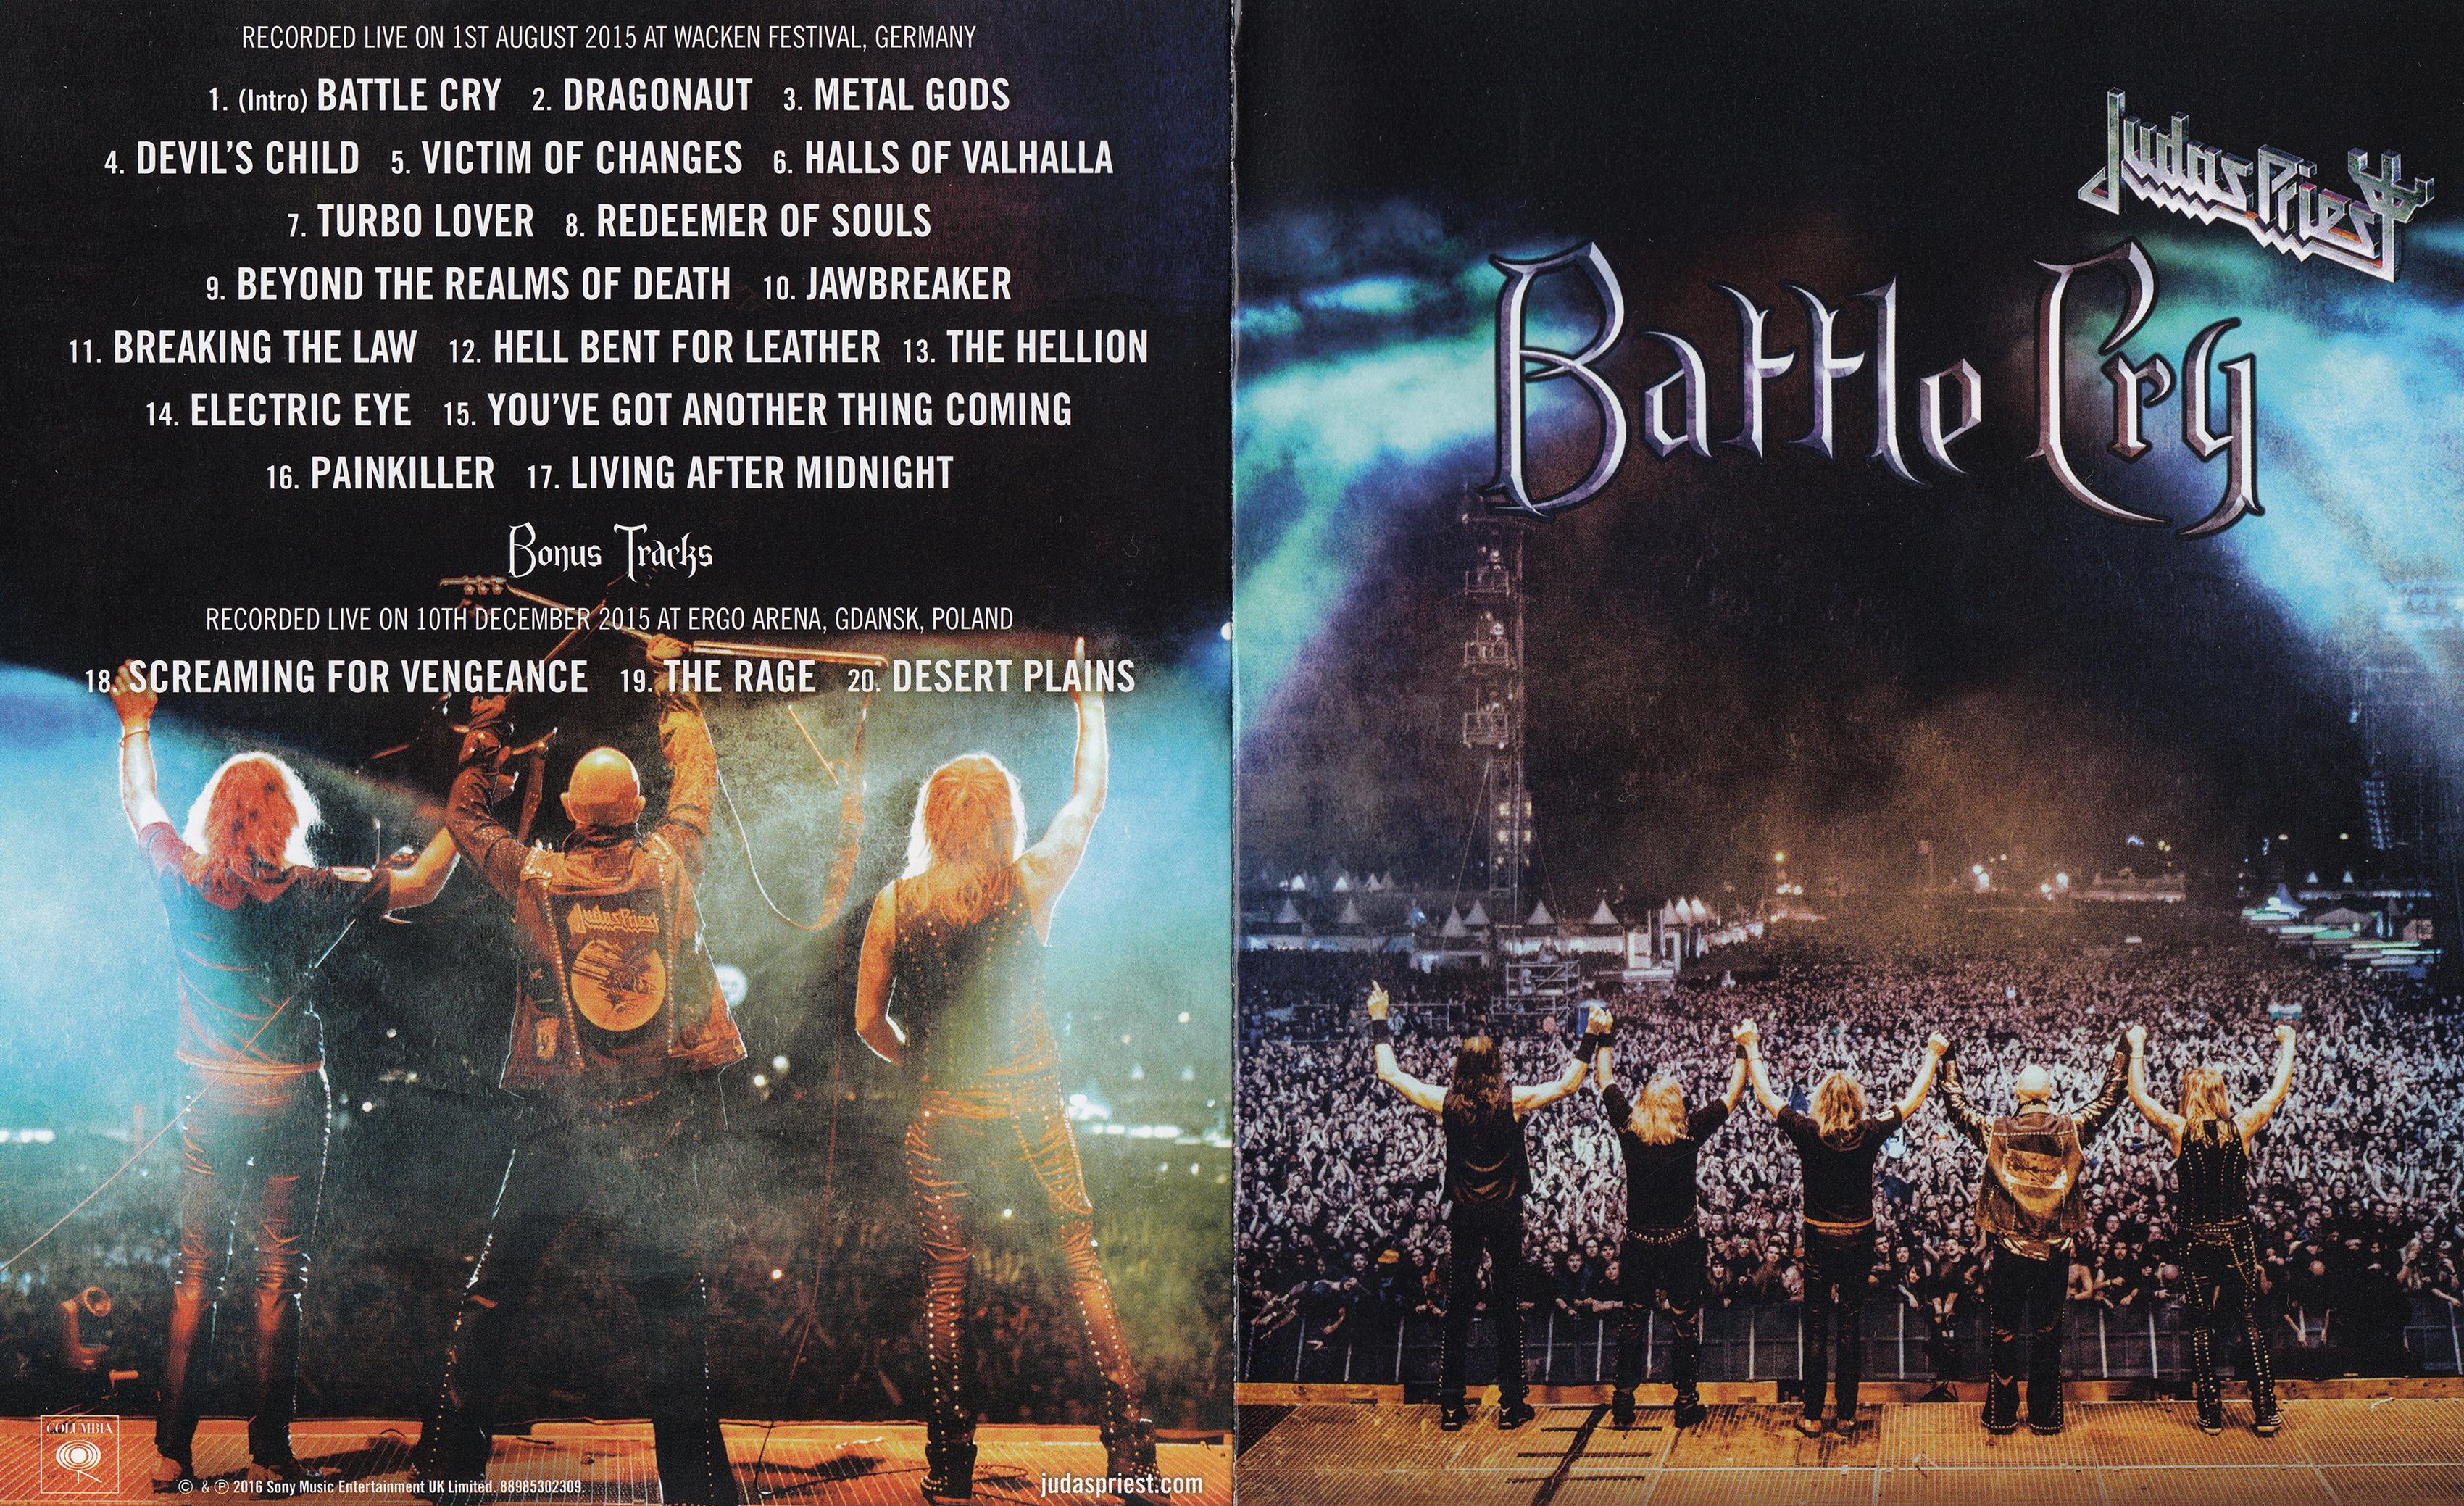 Judas Priest - Battle Cry Blu ray 30 gb exclusivo